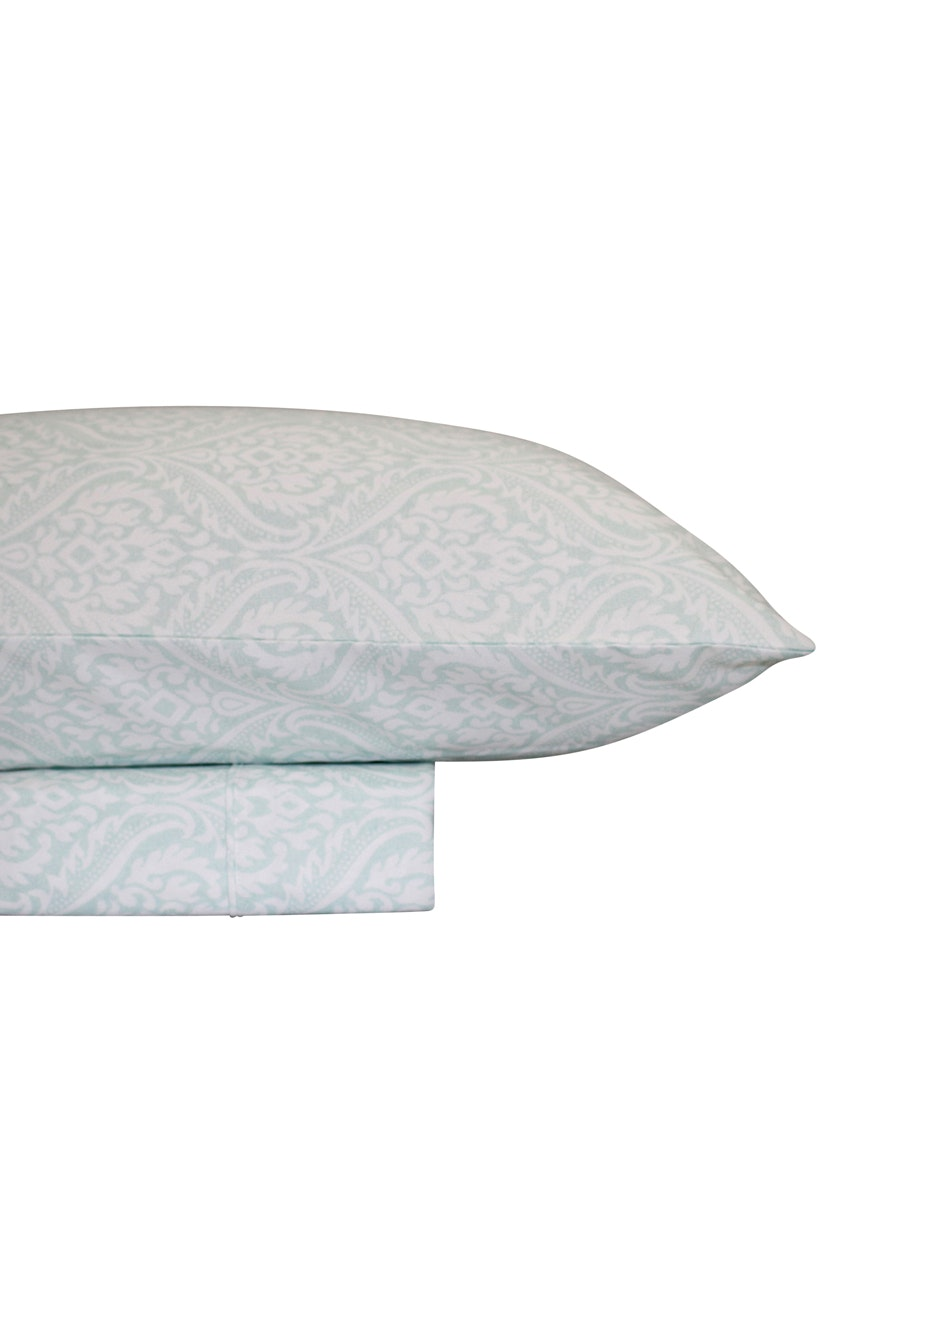 Thermal Flannel Sheet Sets - Haven Design - Ice - King Bed